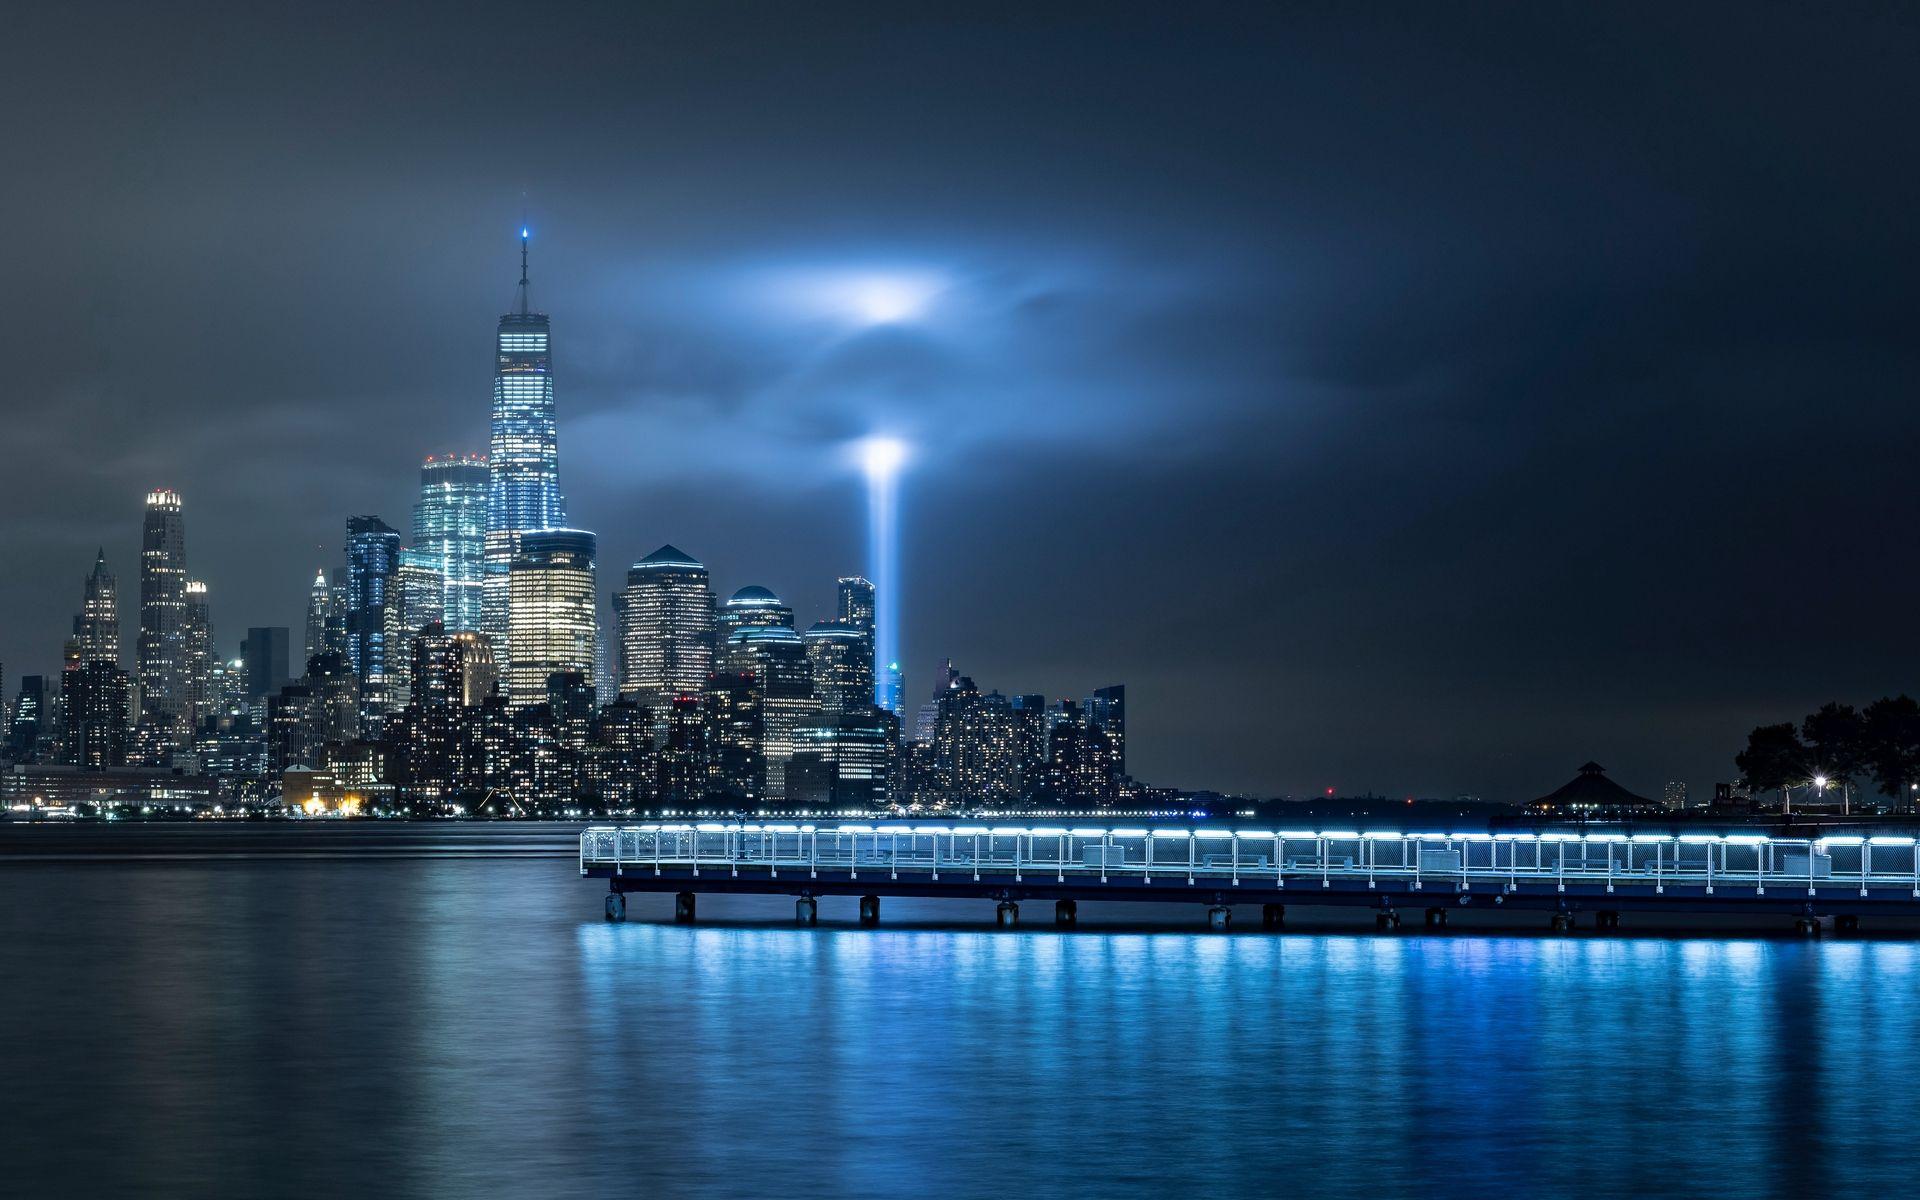 Night New York City One World Trade Center - HD Wallpaper